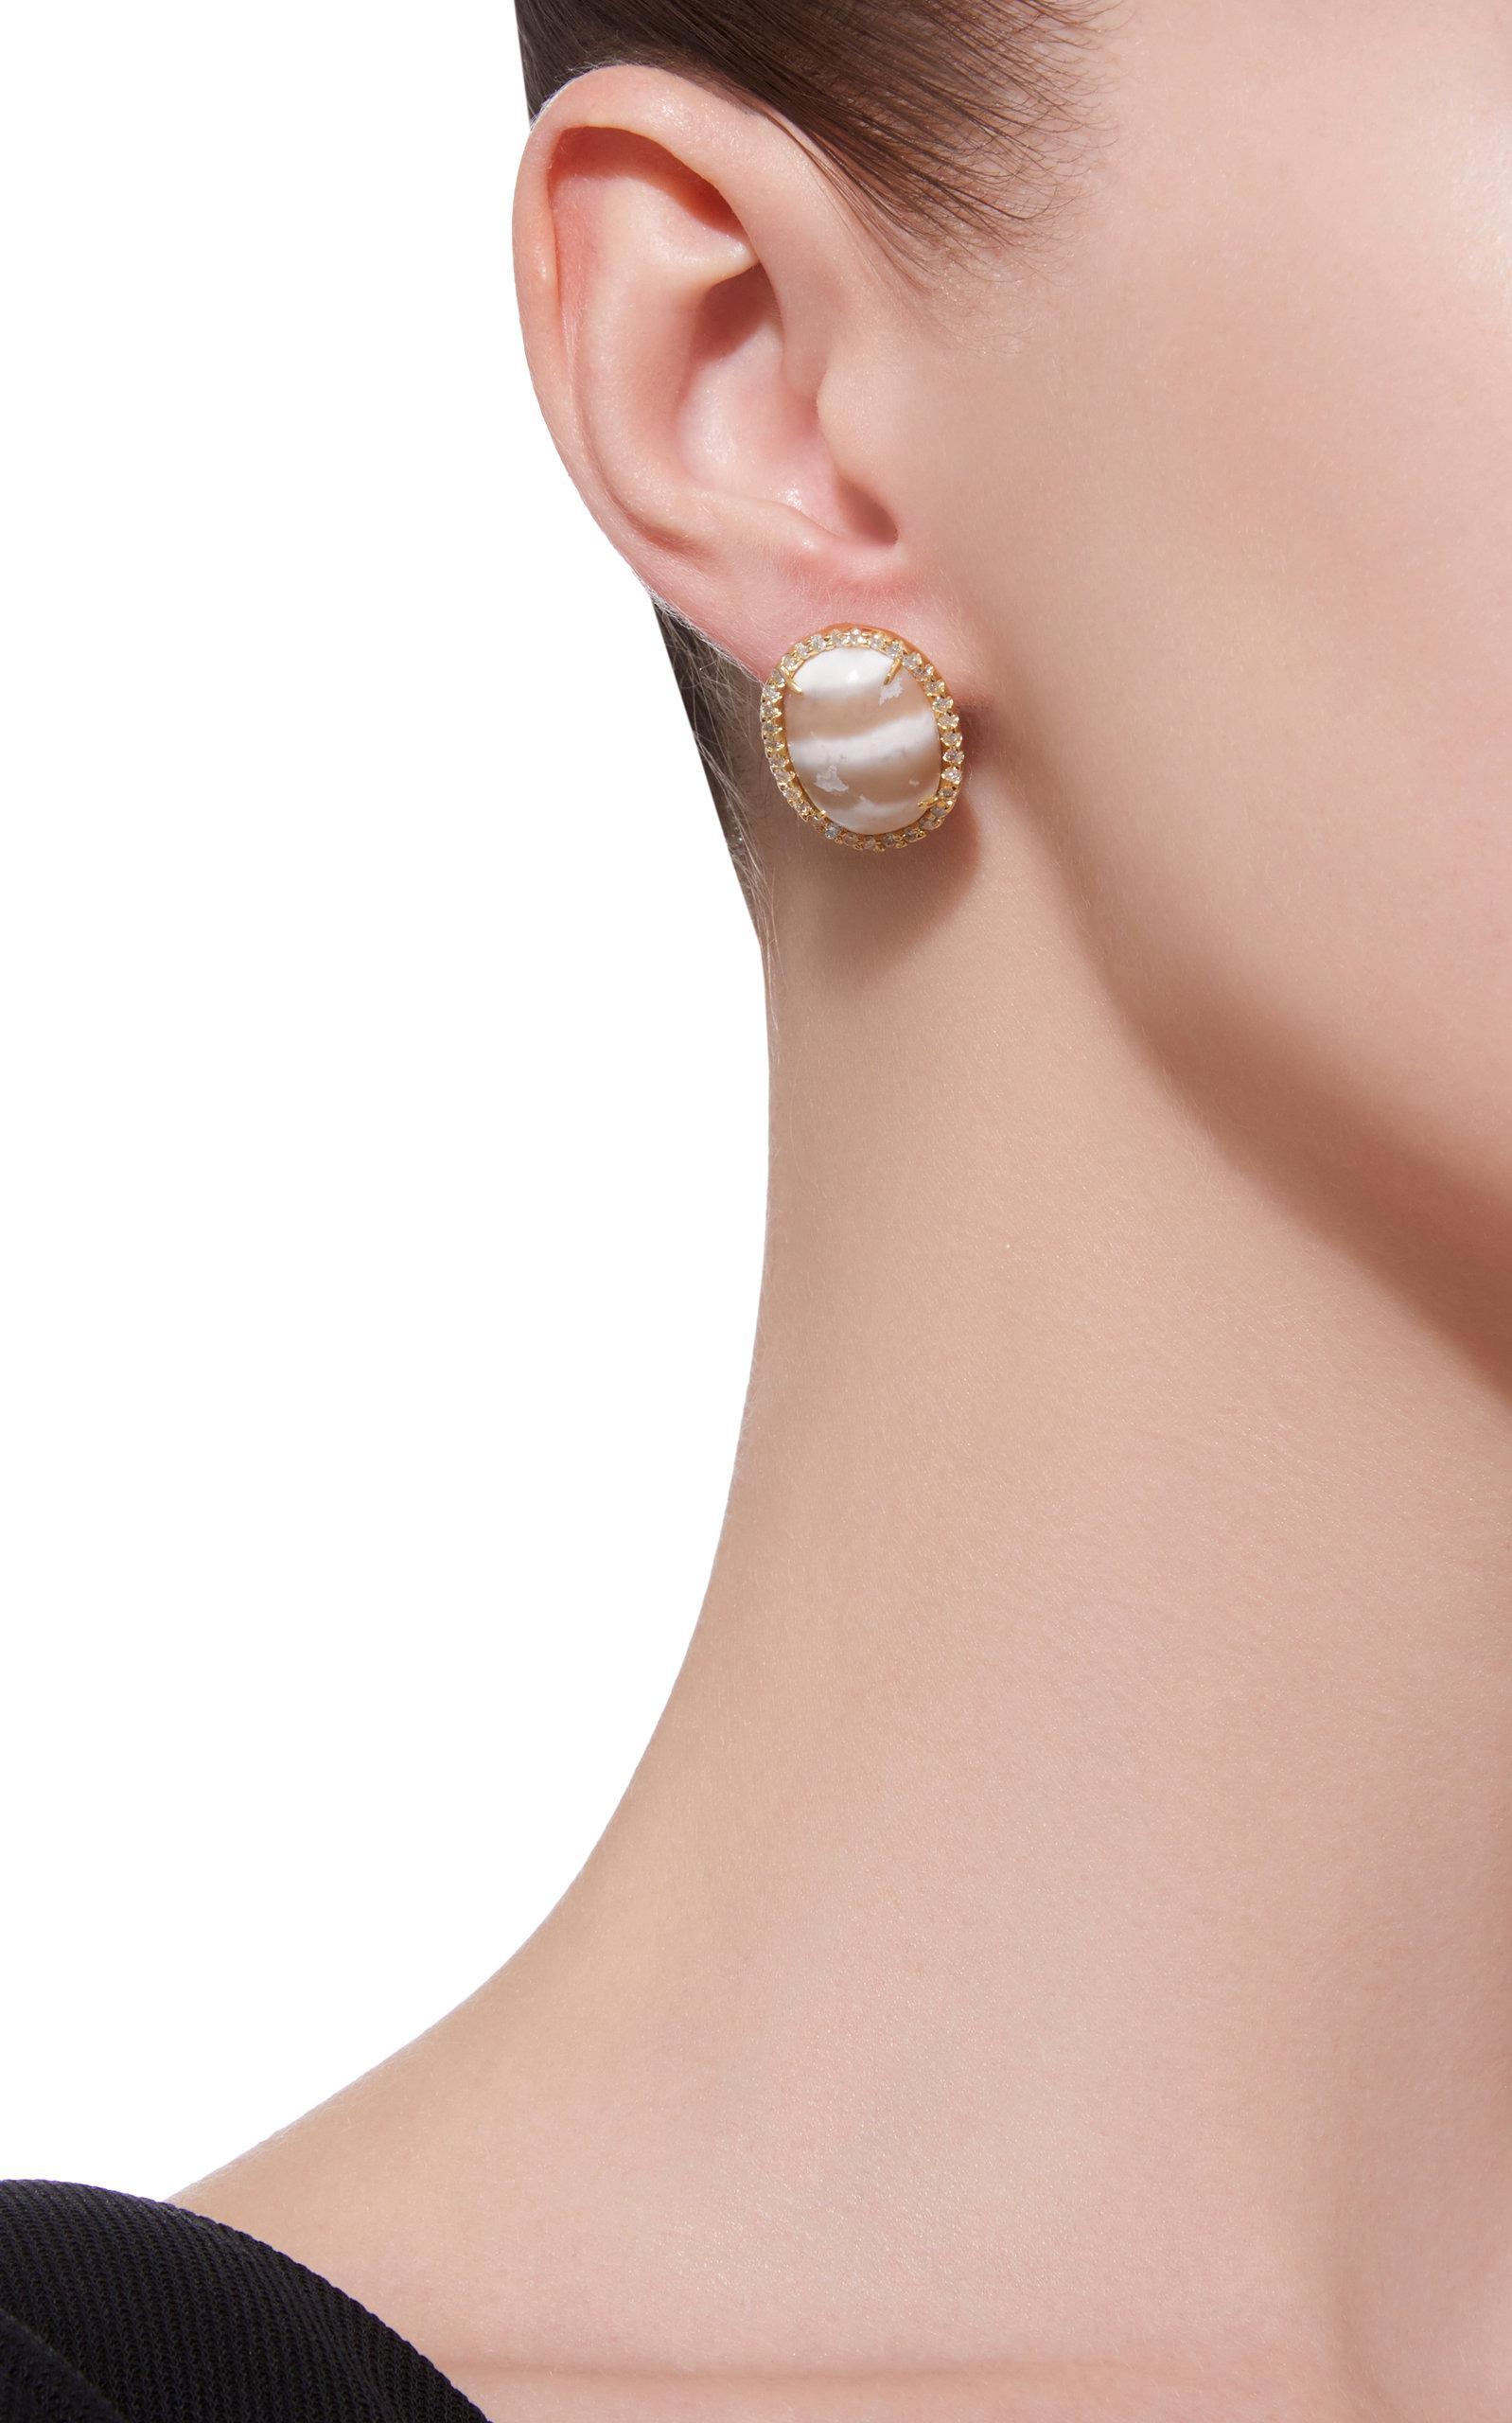 18K Gold Diamond and Chalcedony Earrings Kimberly McDonald DdhZP